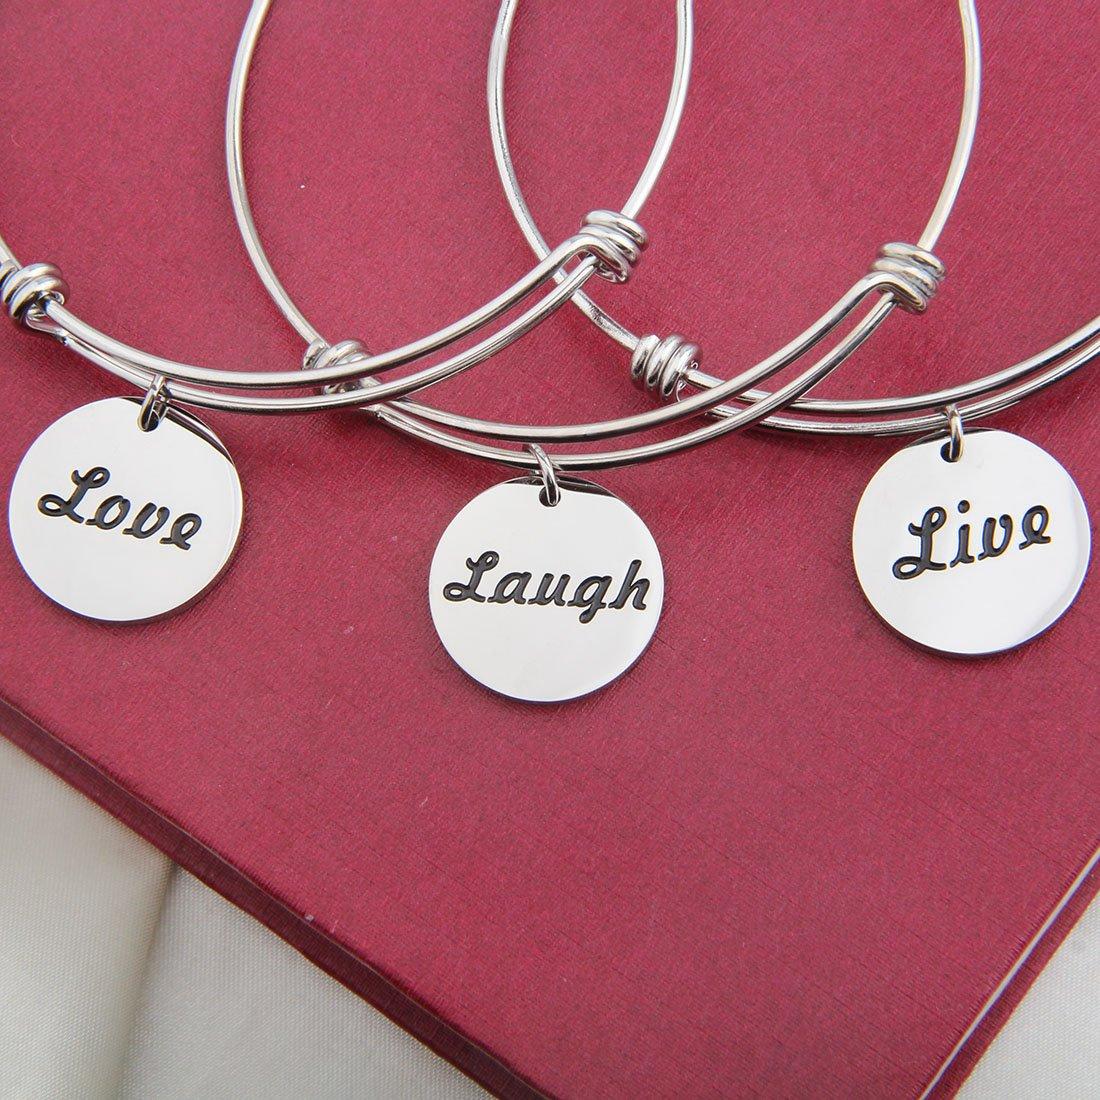 bobauna Mantra Live Laugh Love Bracelet Set Keychain Inspirational Jewelry Gift